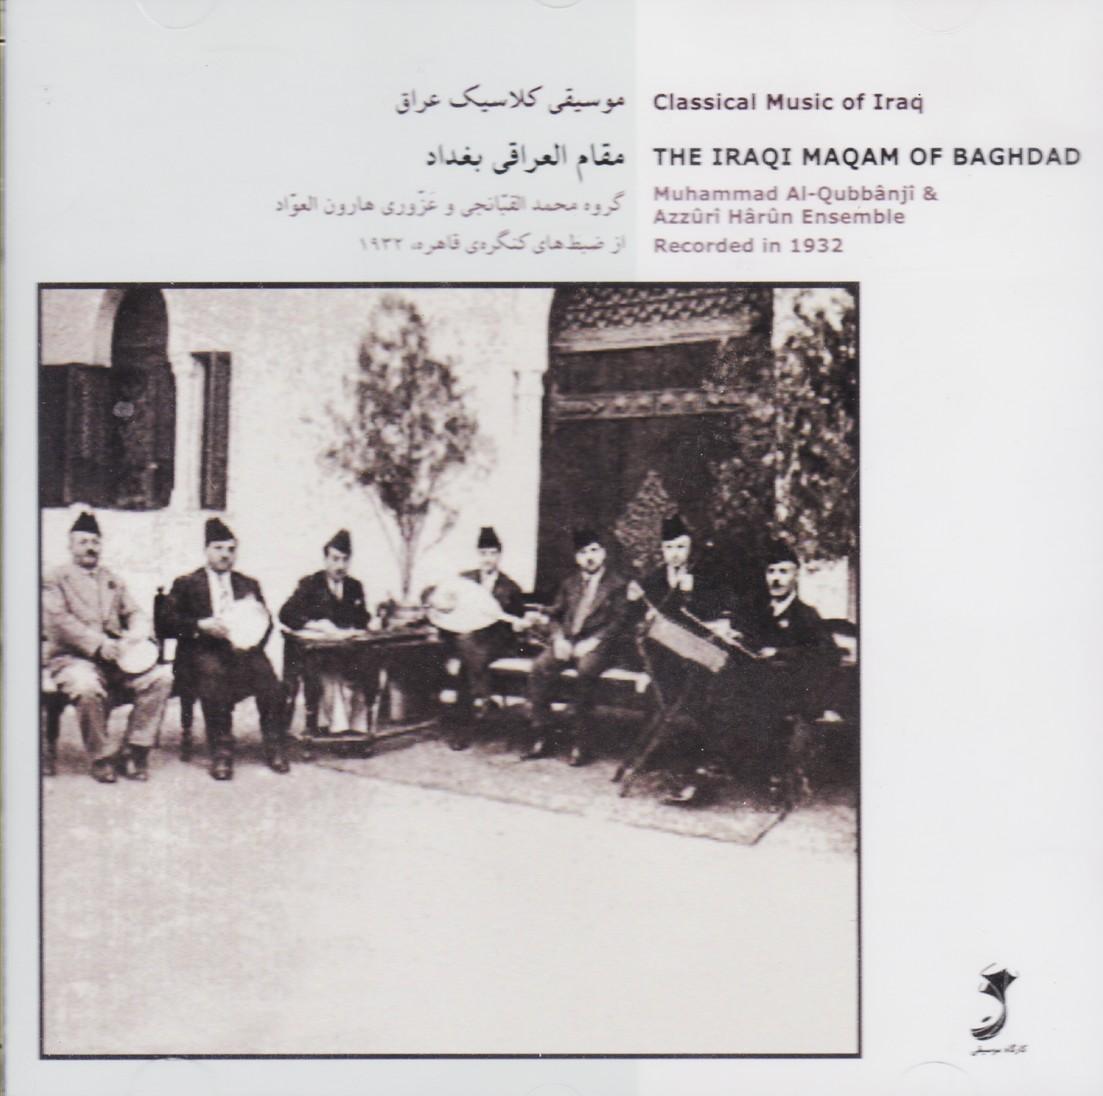 موسیقی کلاسیک عراق (مقام العراقی بغداد)